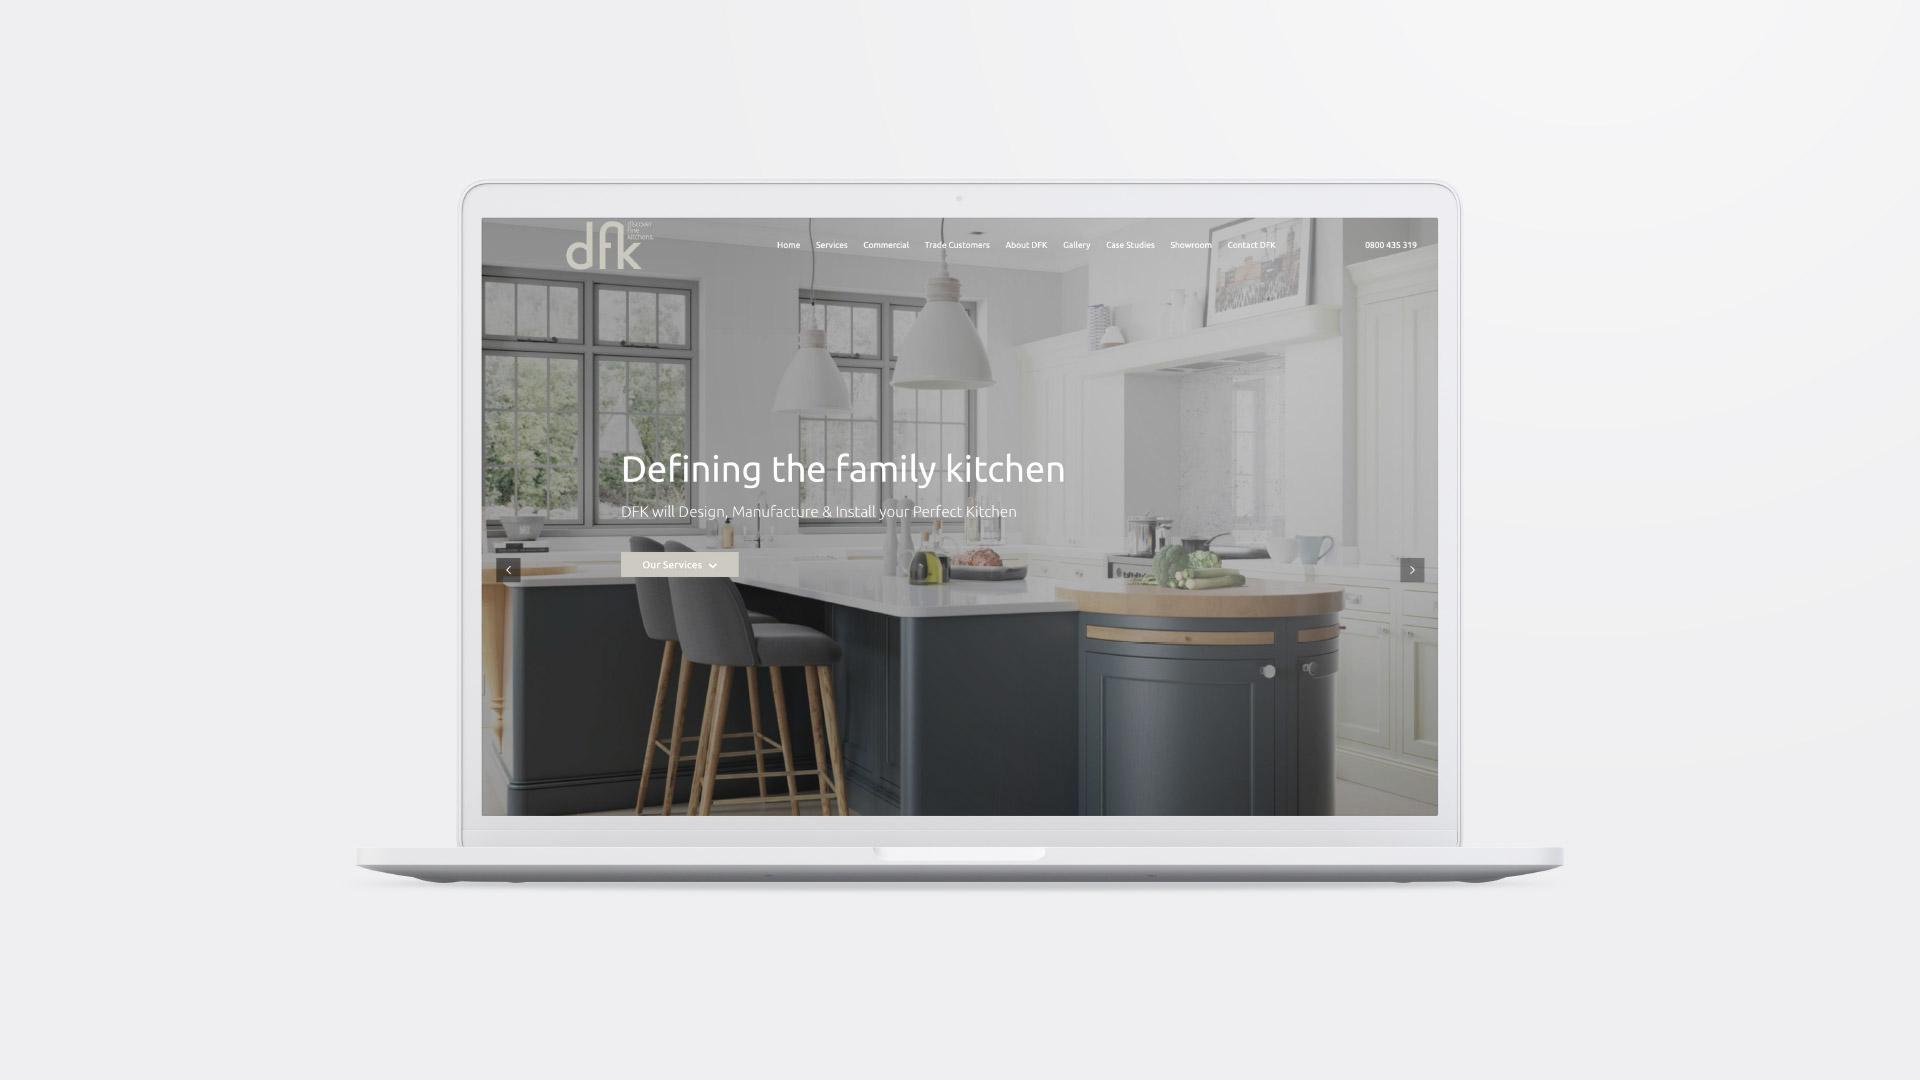 DFK website refresh